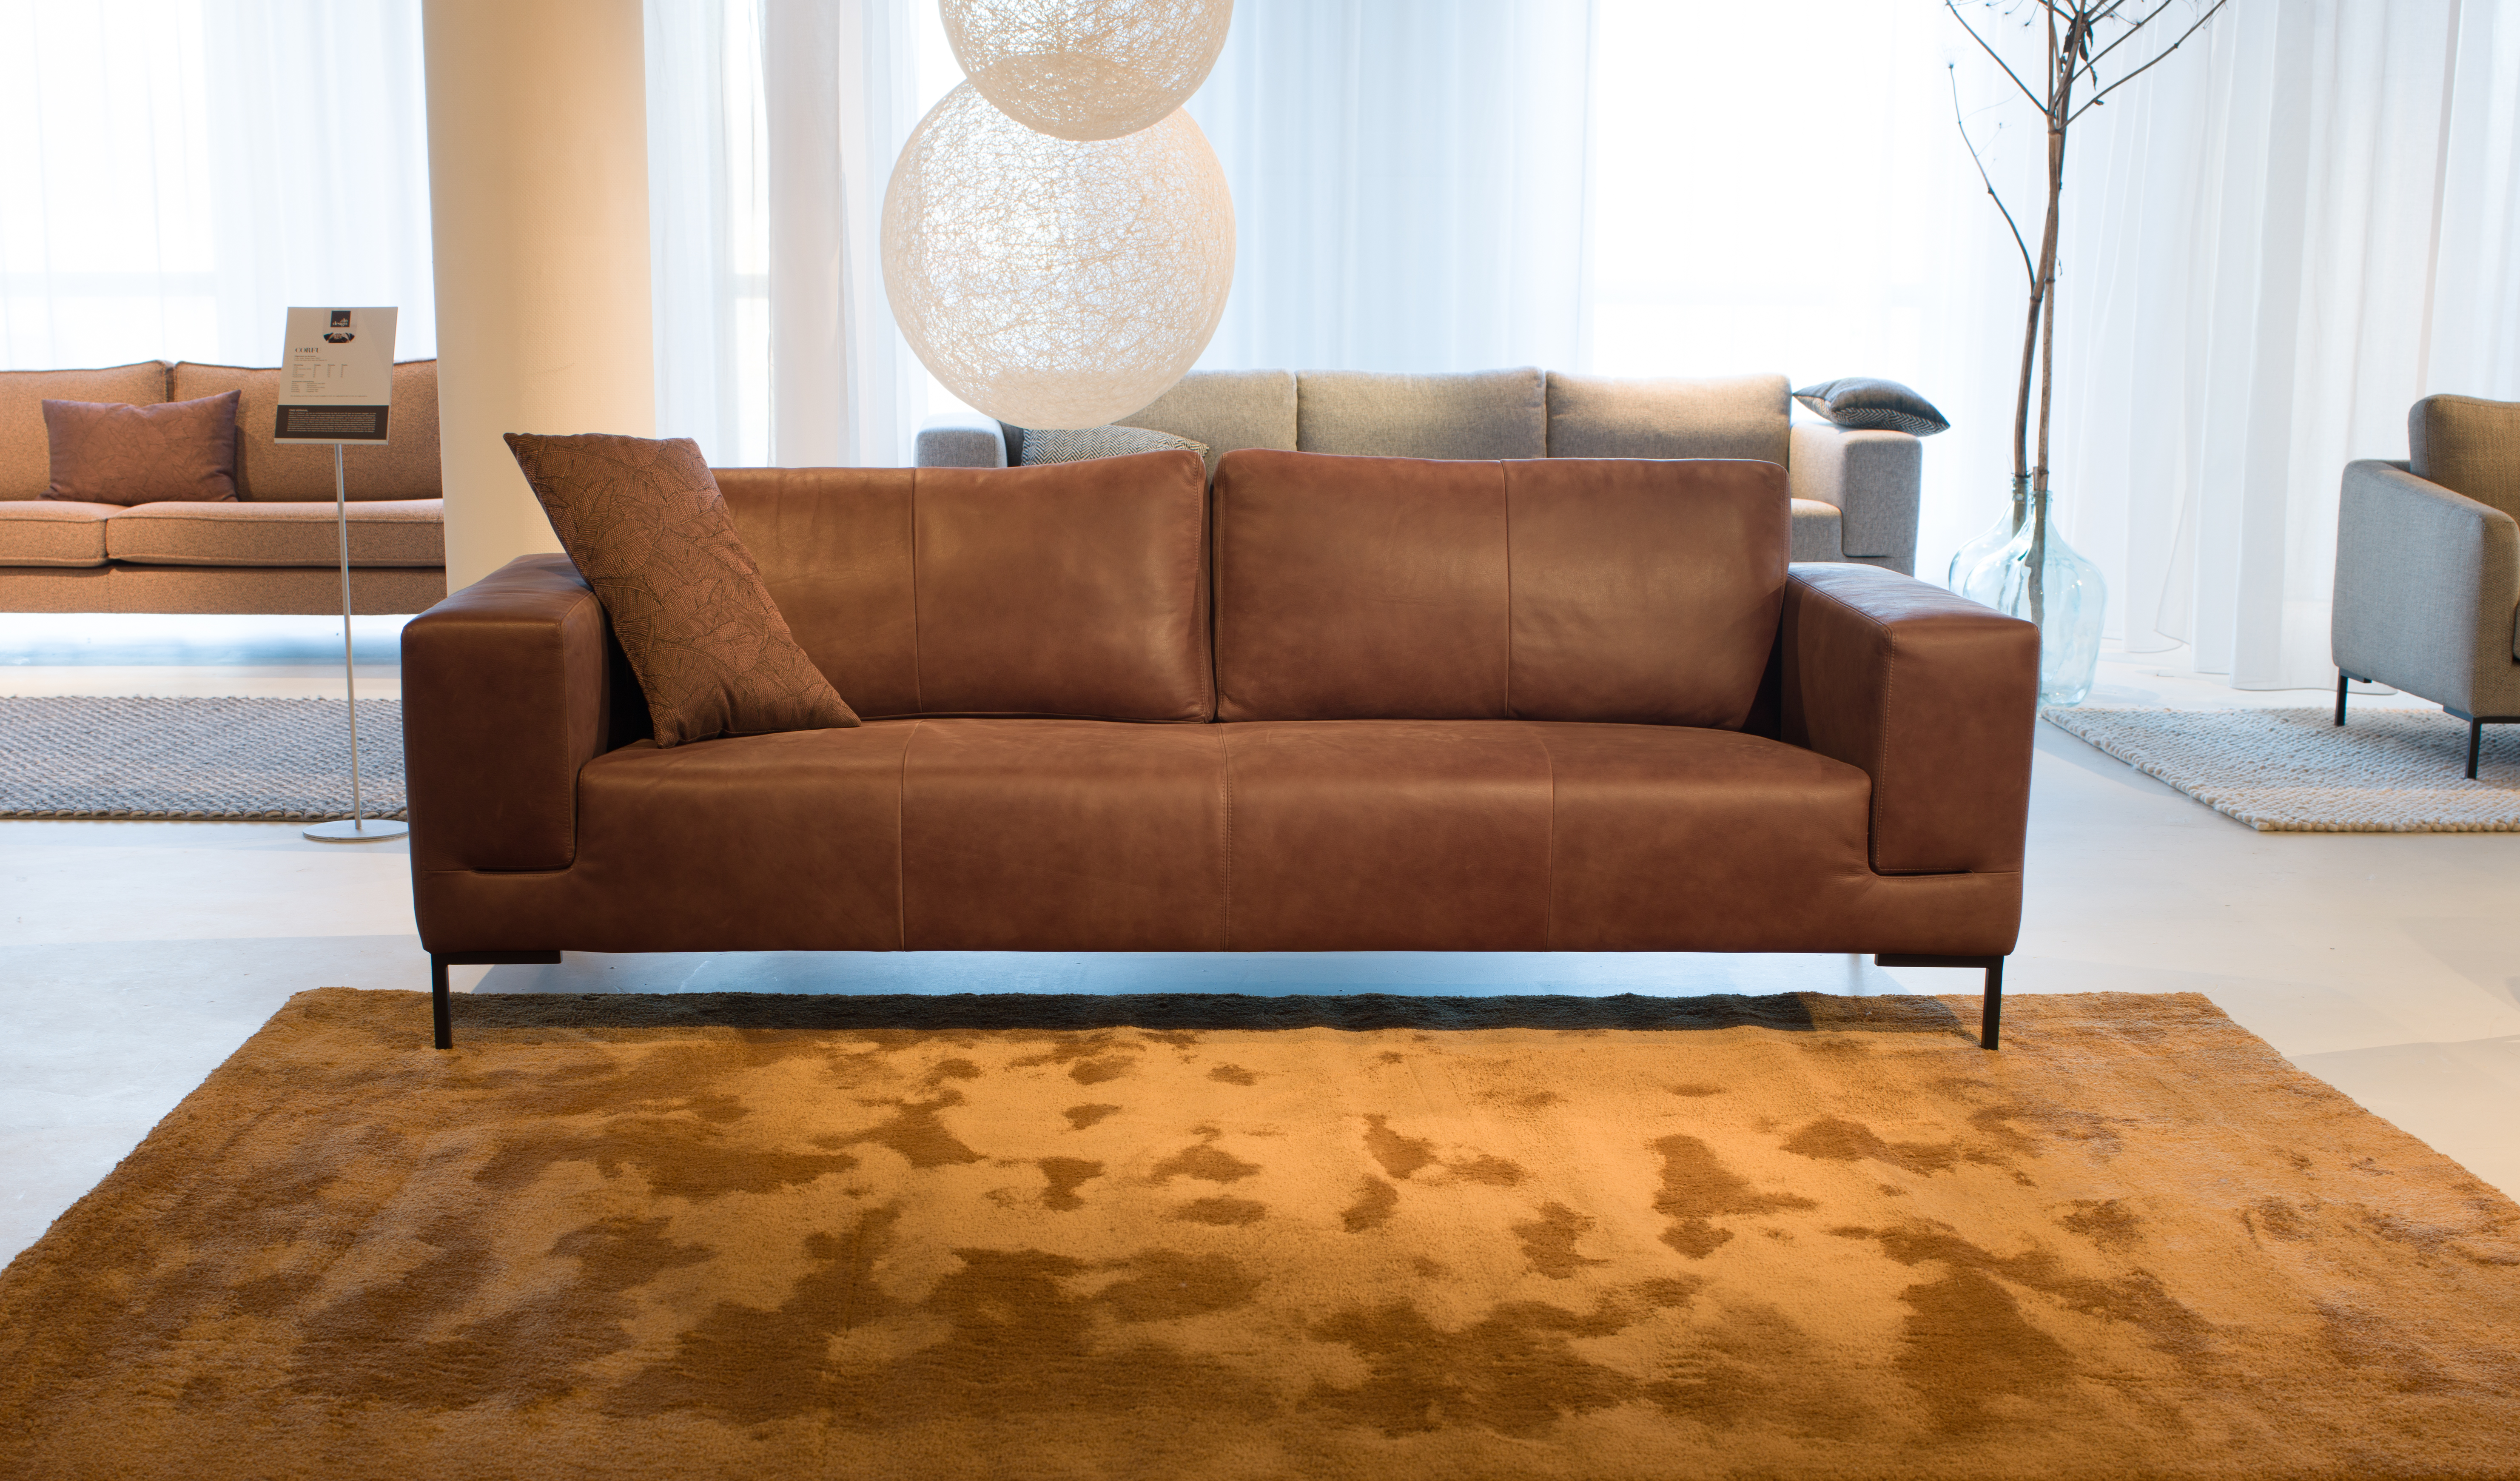 Machinal woven high pile shaggy, 30 mm.